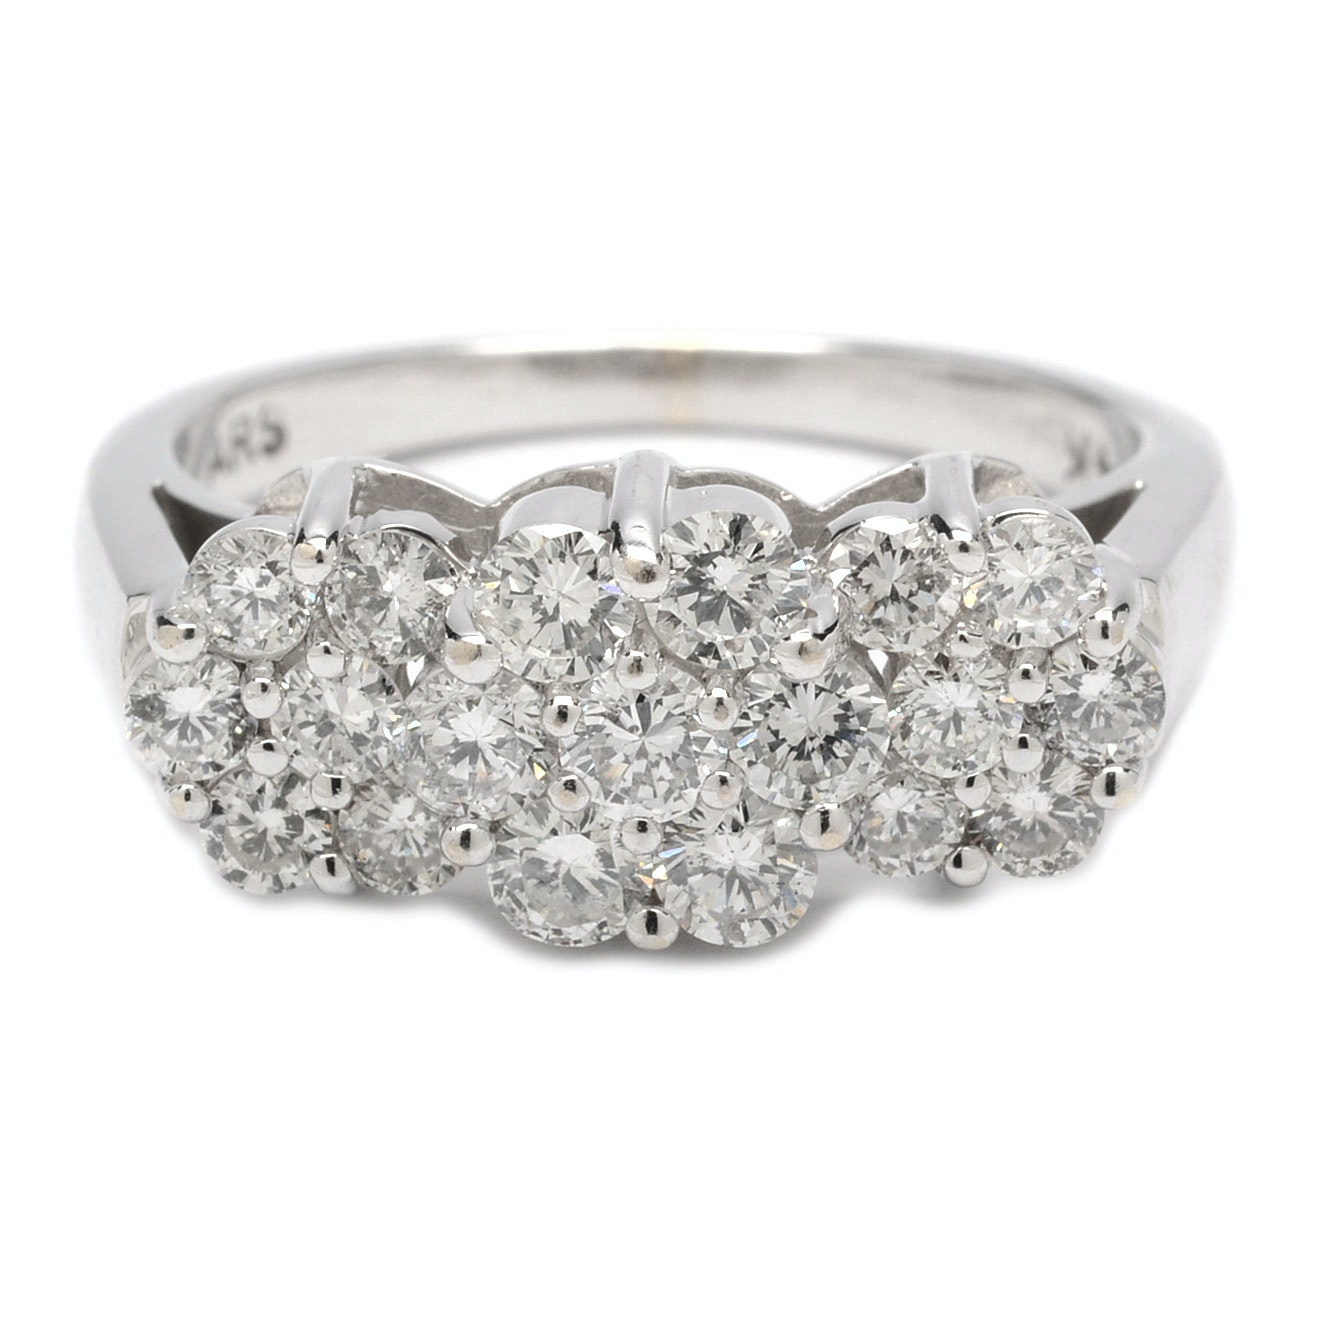 14K White Gold 1.04 CTW Diamond Stylized Flower Ring